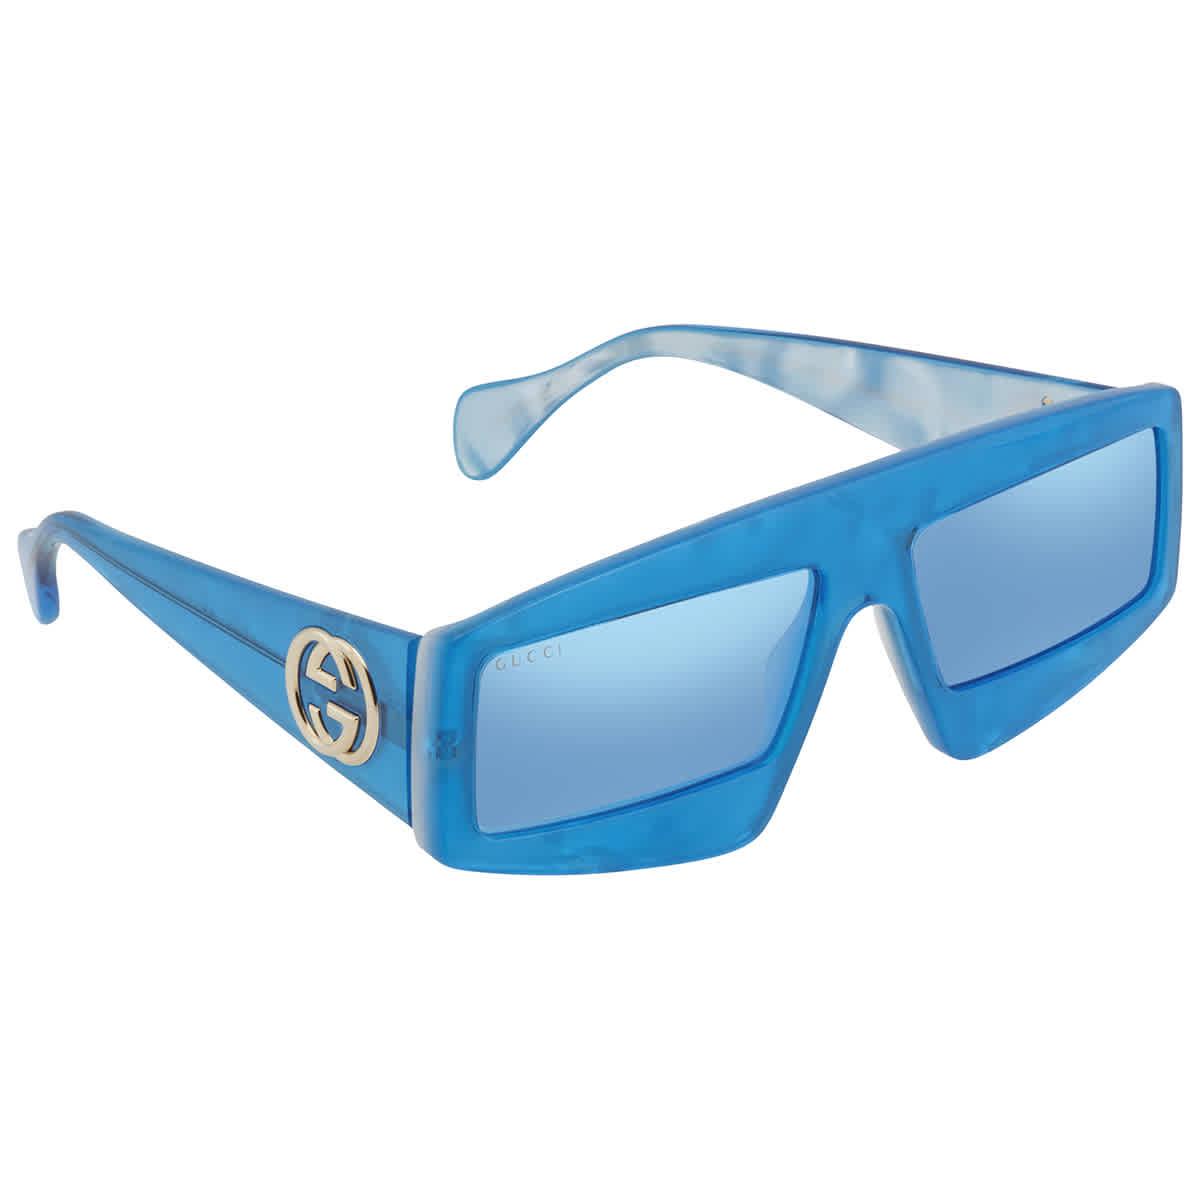 Gucci Blue Rectangular Ladies Sunglasses Gg0358s00461